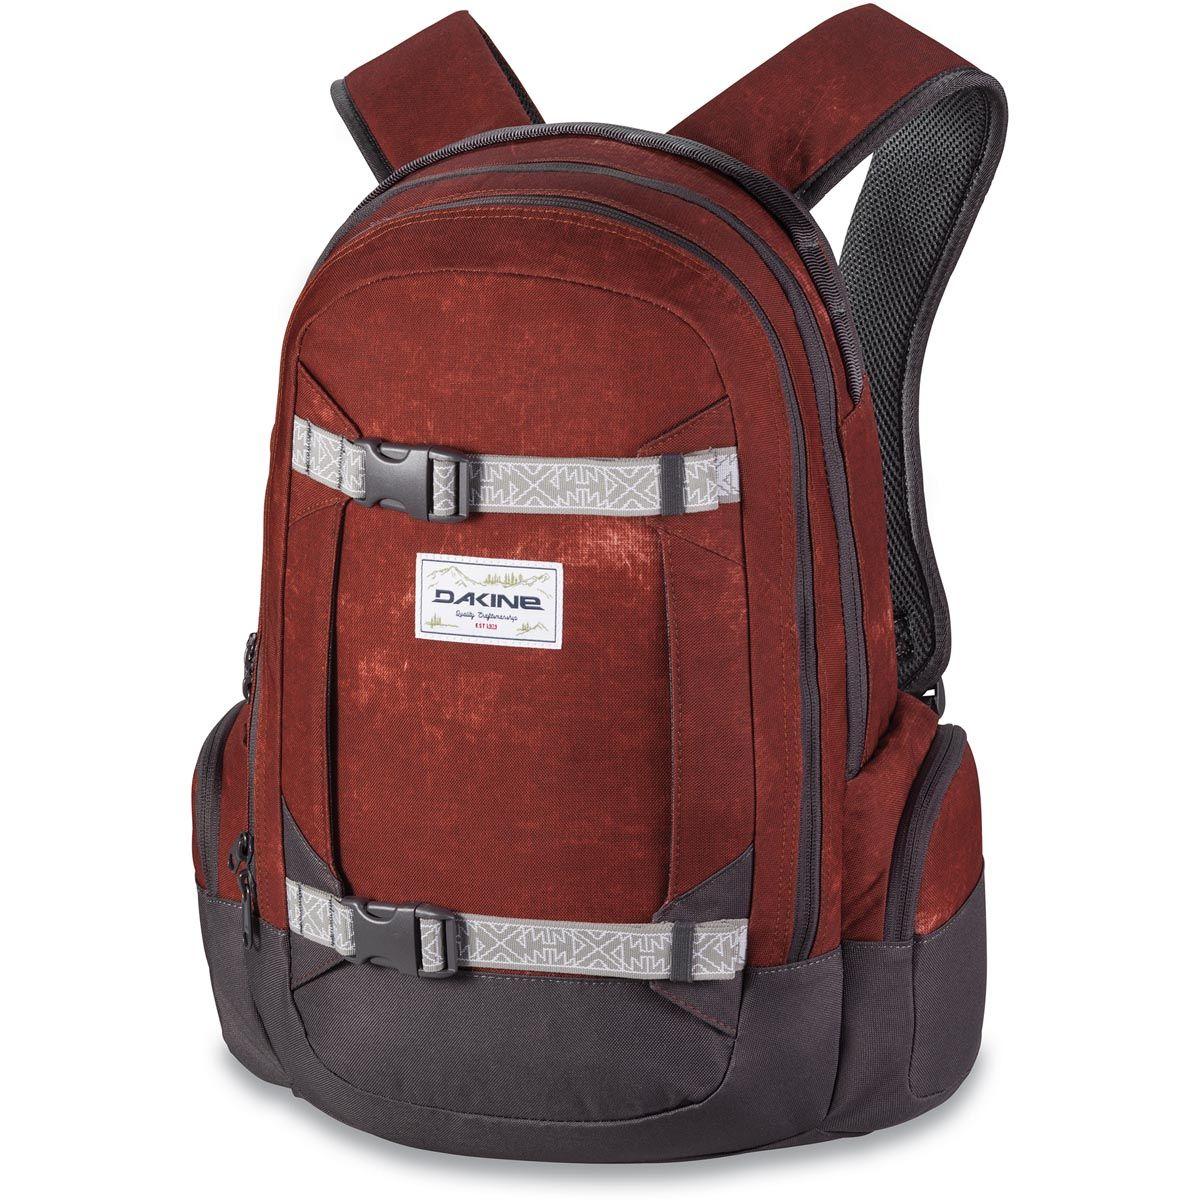 Dakine Mission 25l Backpack Dakine Backpacks Dakine 25l Backpack